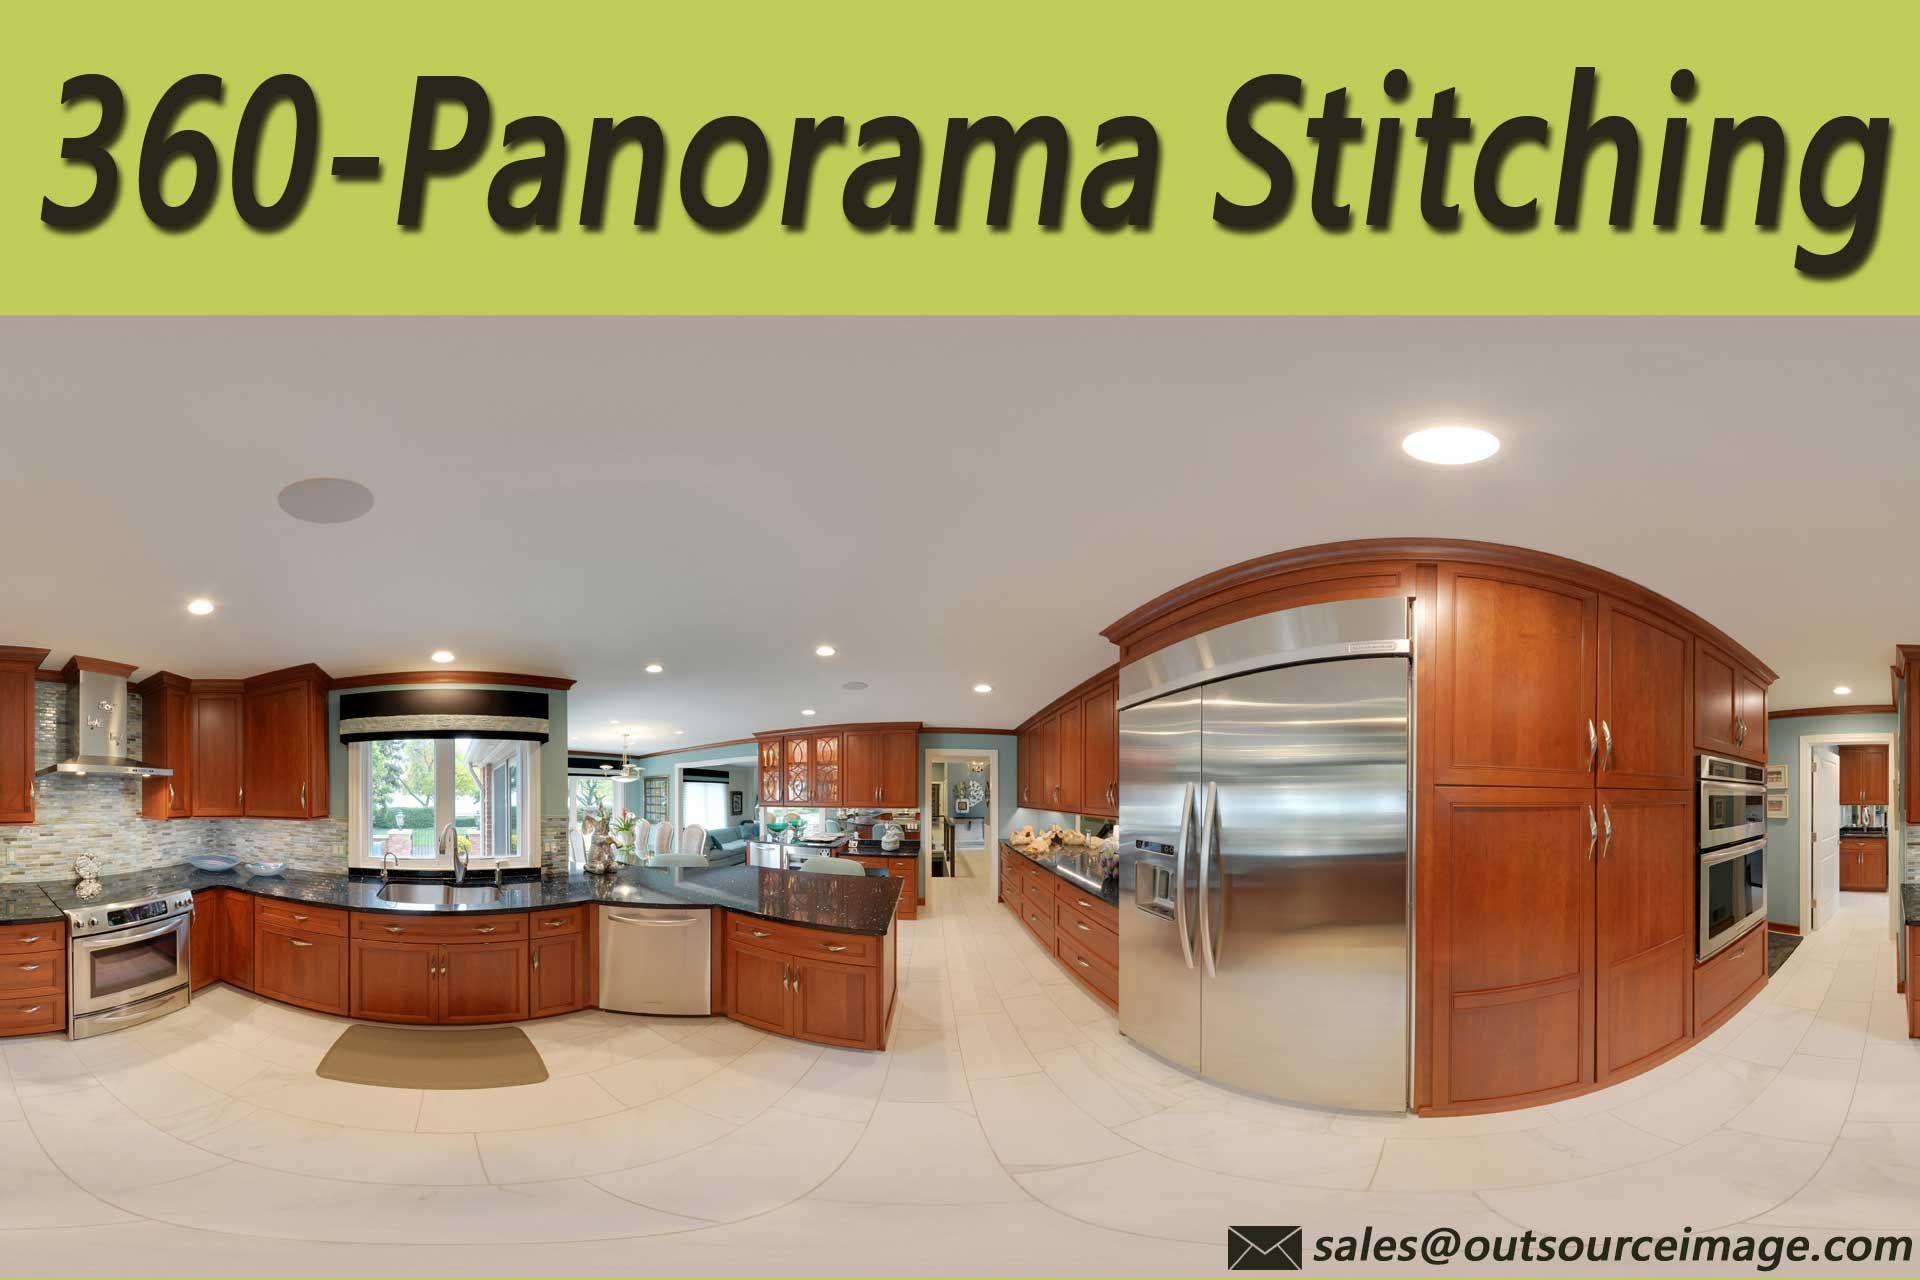 360-degree panorama stitching to photography  Get